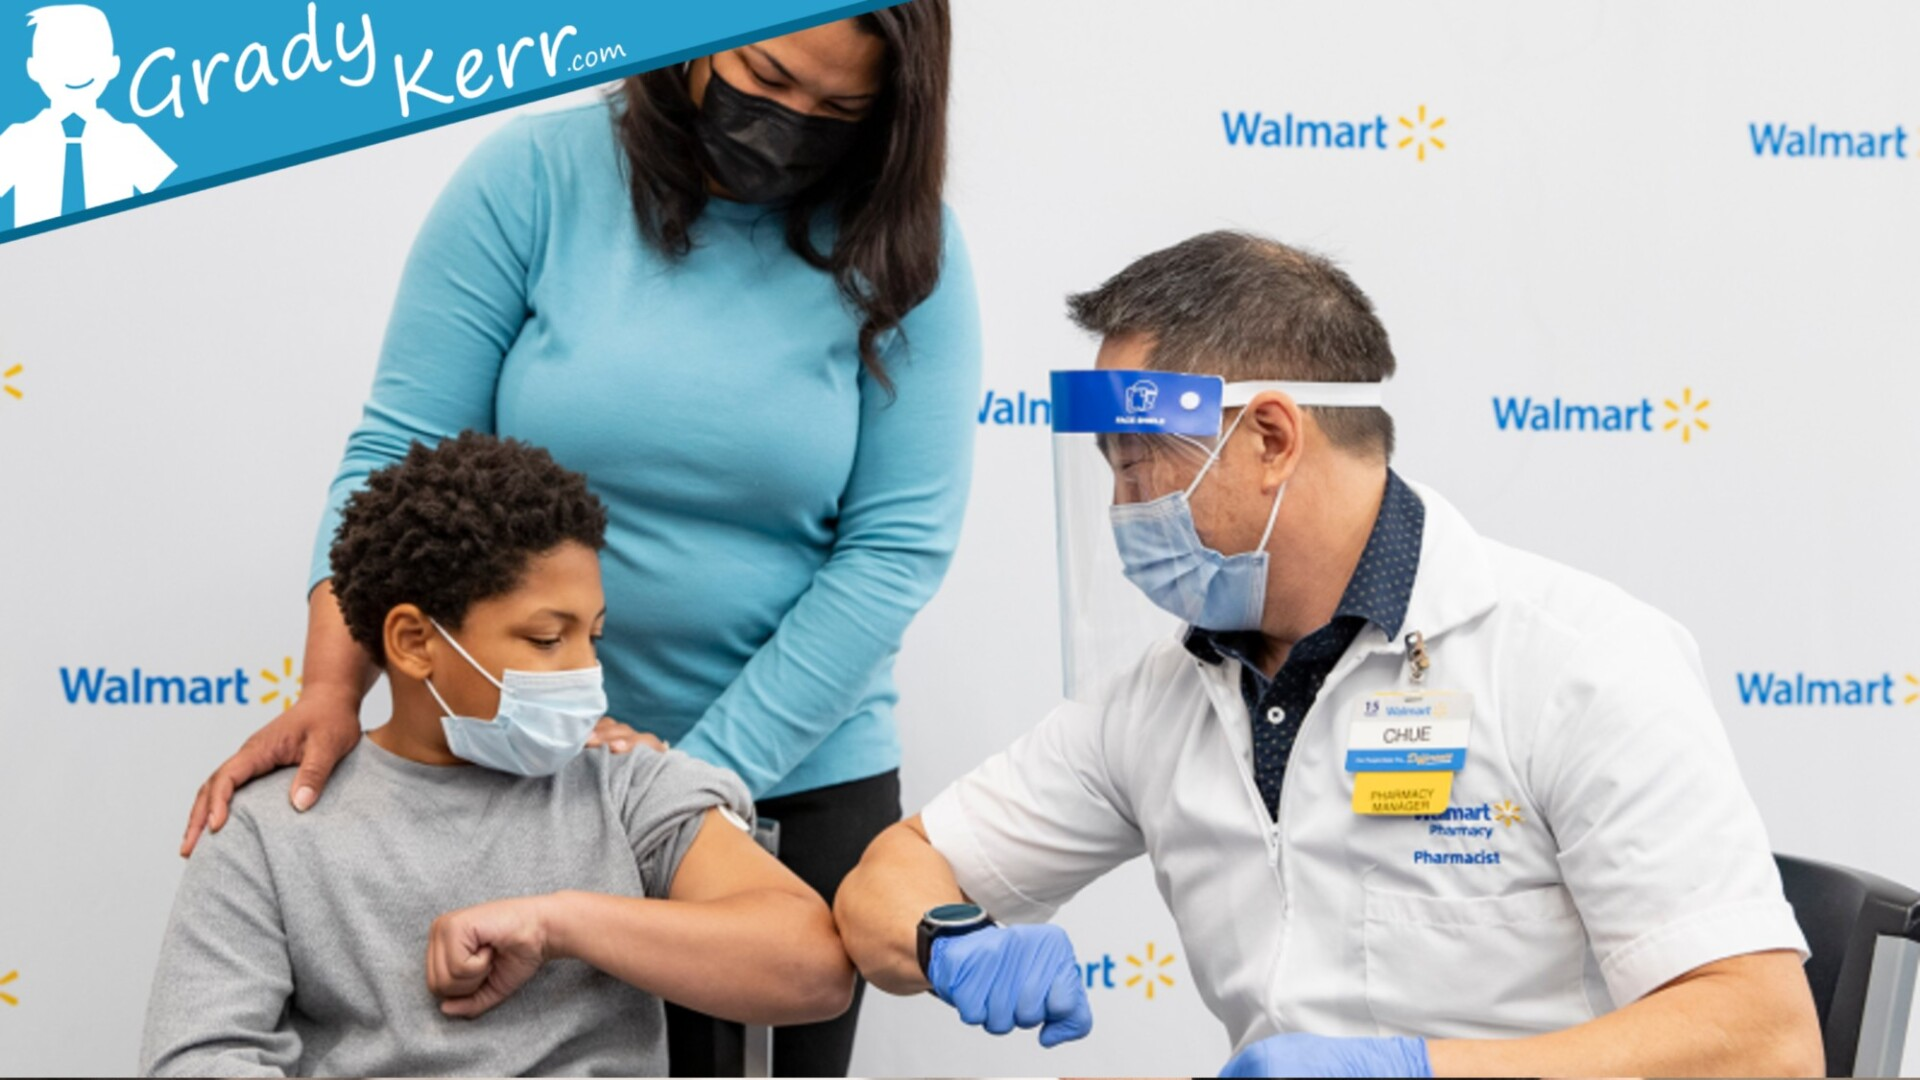 Boy Getting COVID Vaccine Dose Administered - GradyKerr.com